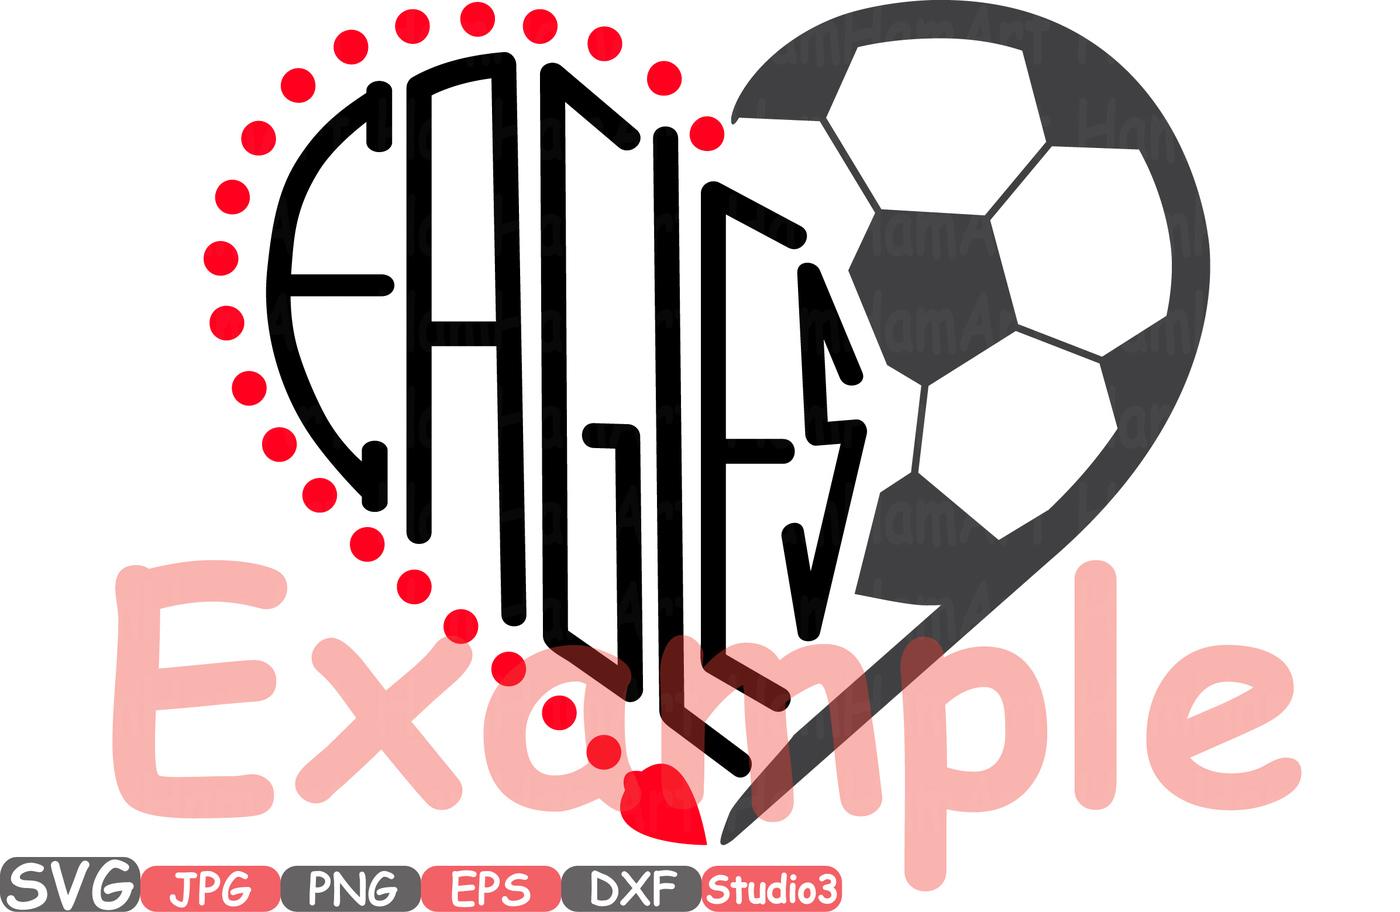 1400x912 Philadelphia Eagles Silhouette Svg Cutting Files Digital Clip Art